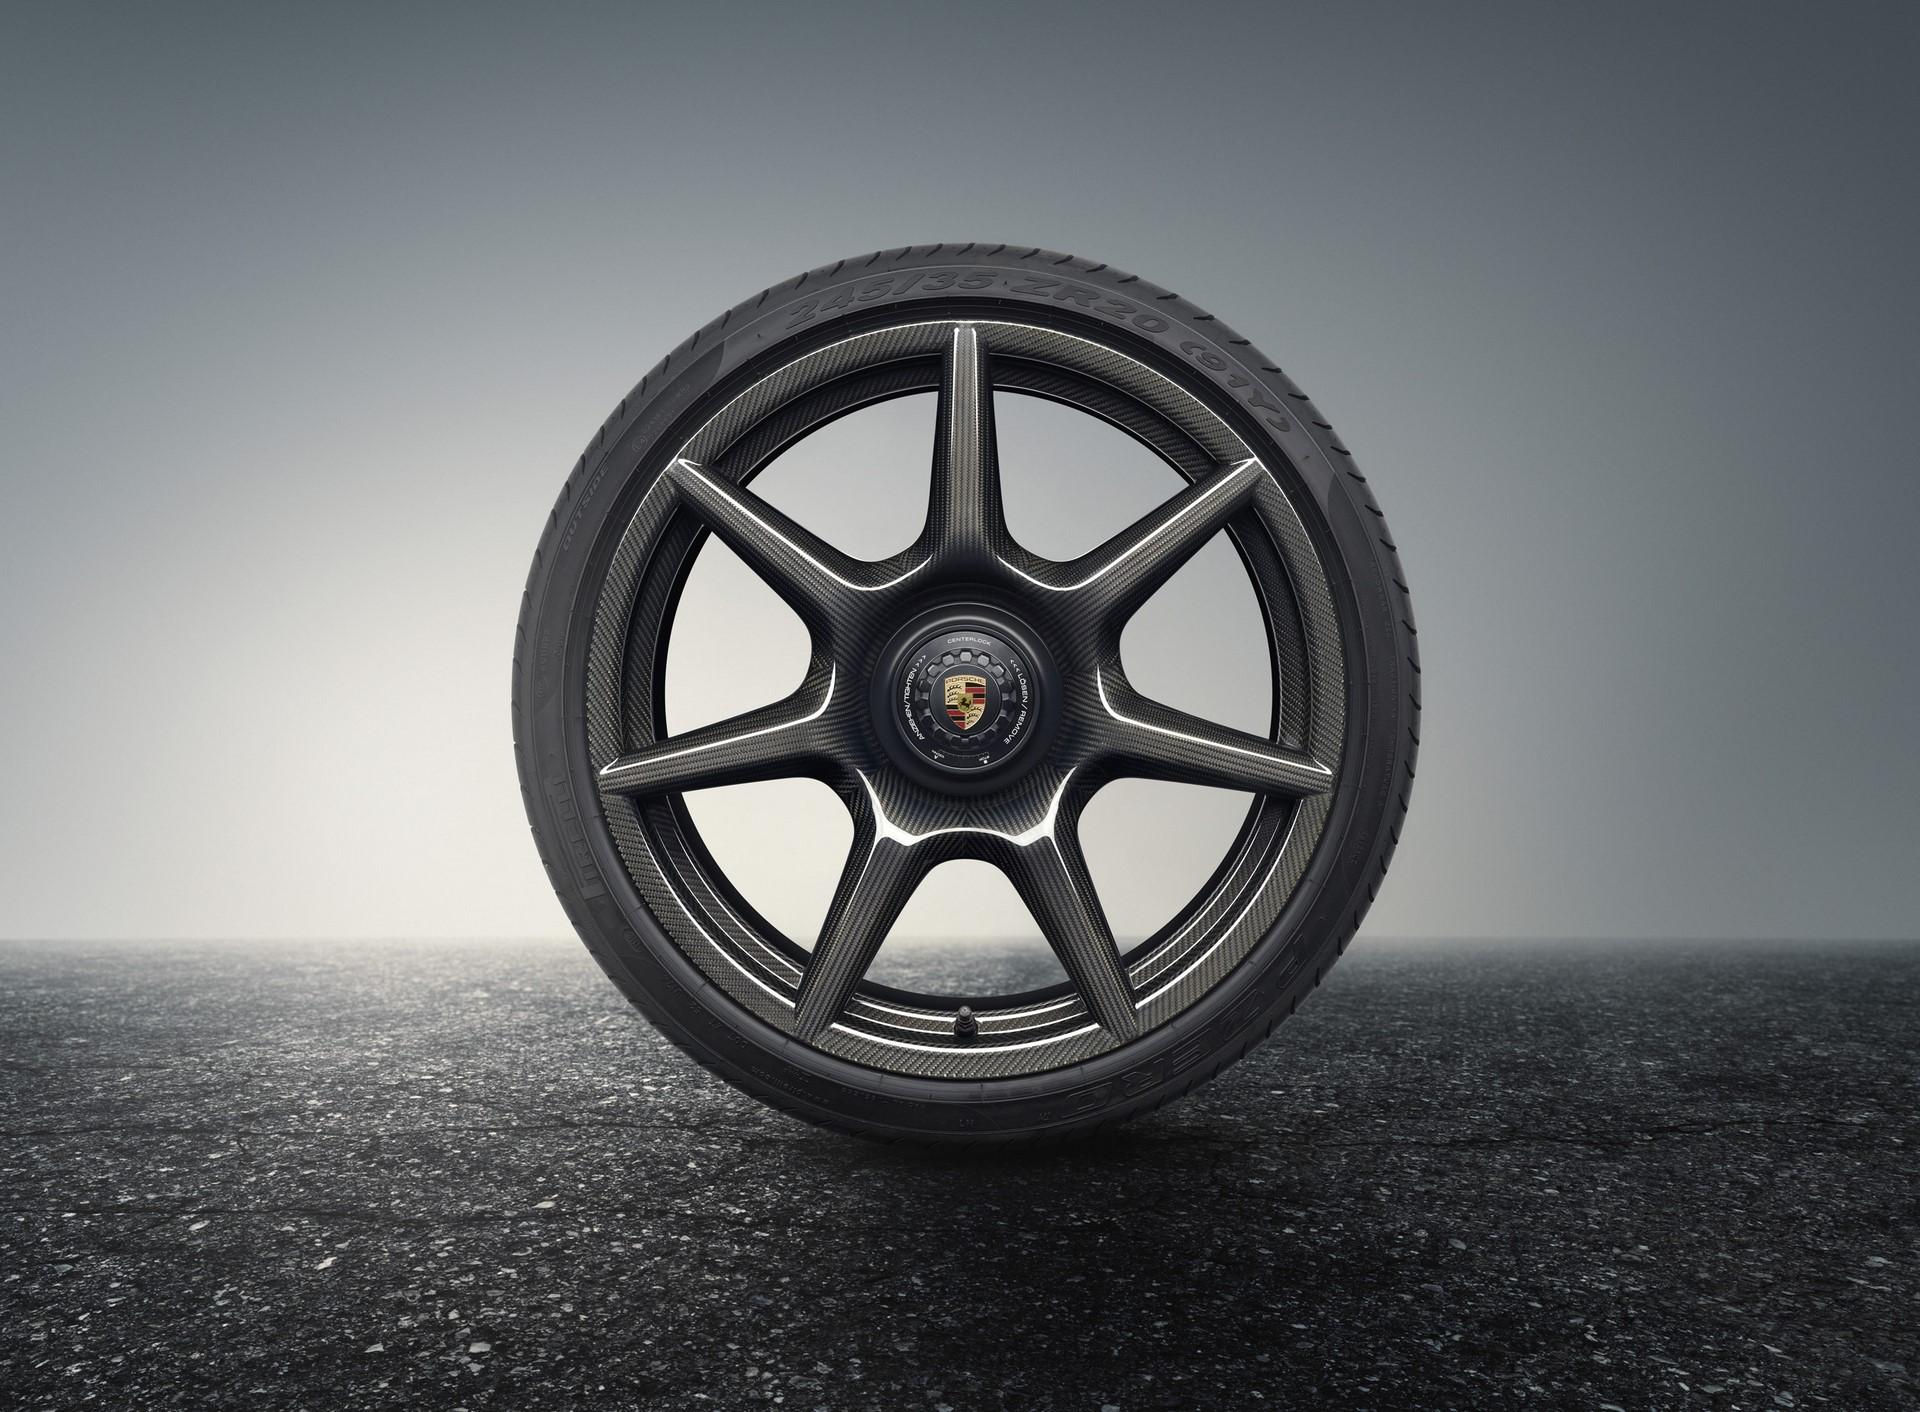 Porsche 911 Turbo S Exclusive Series carbon wheels (2)